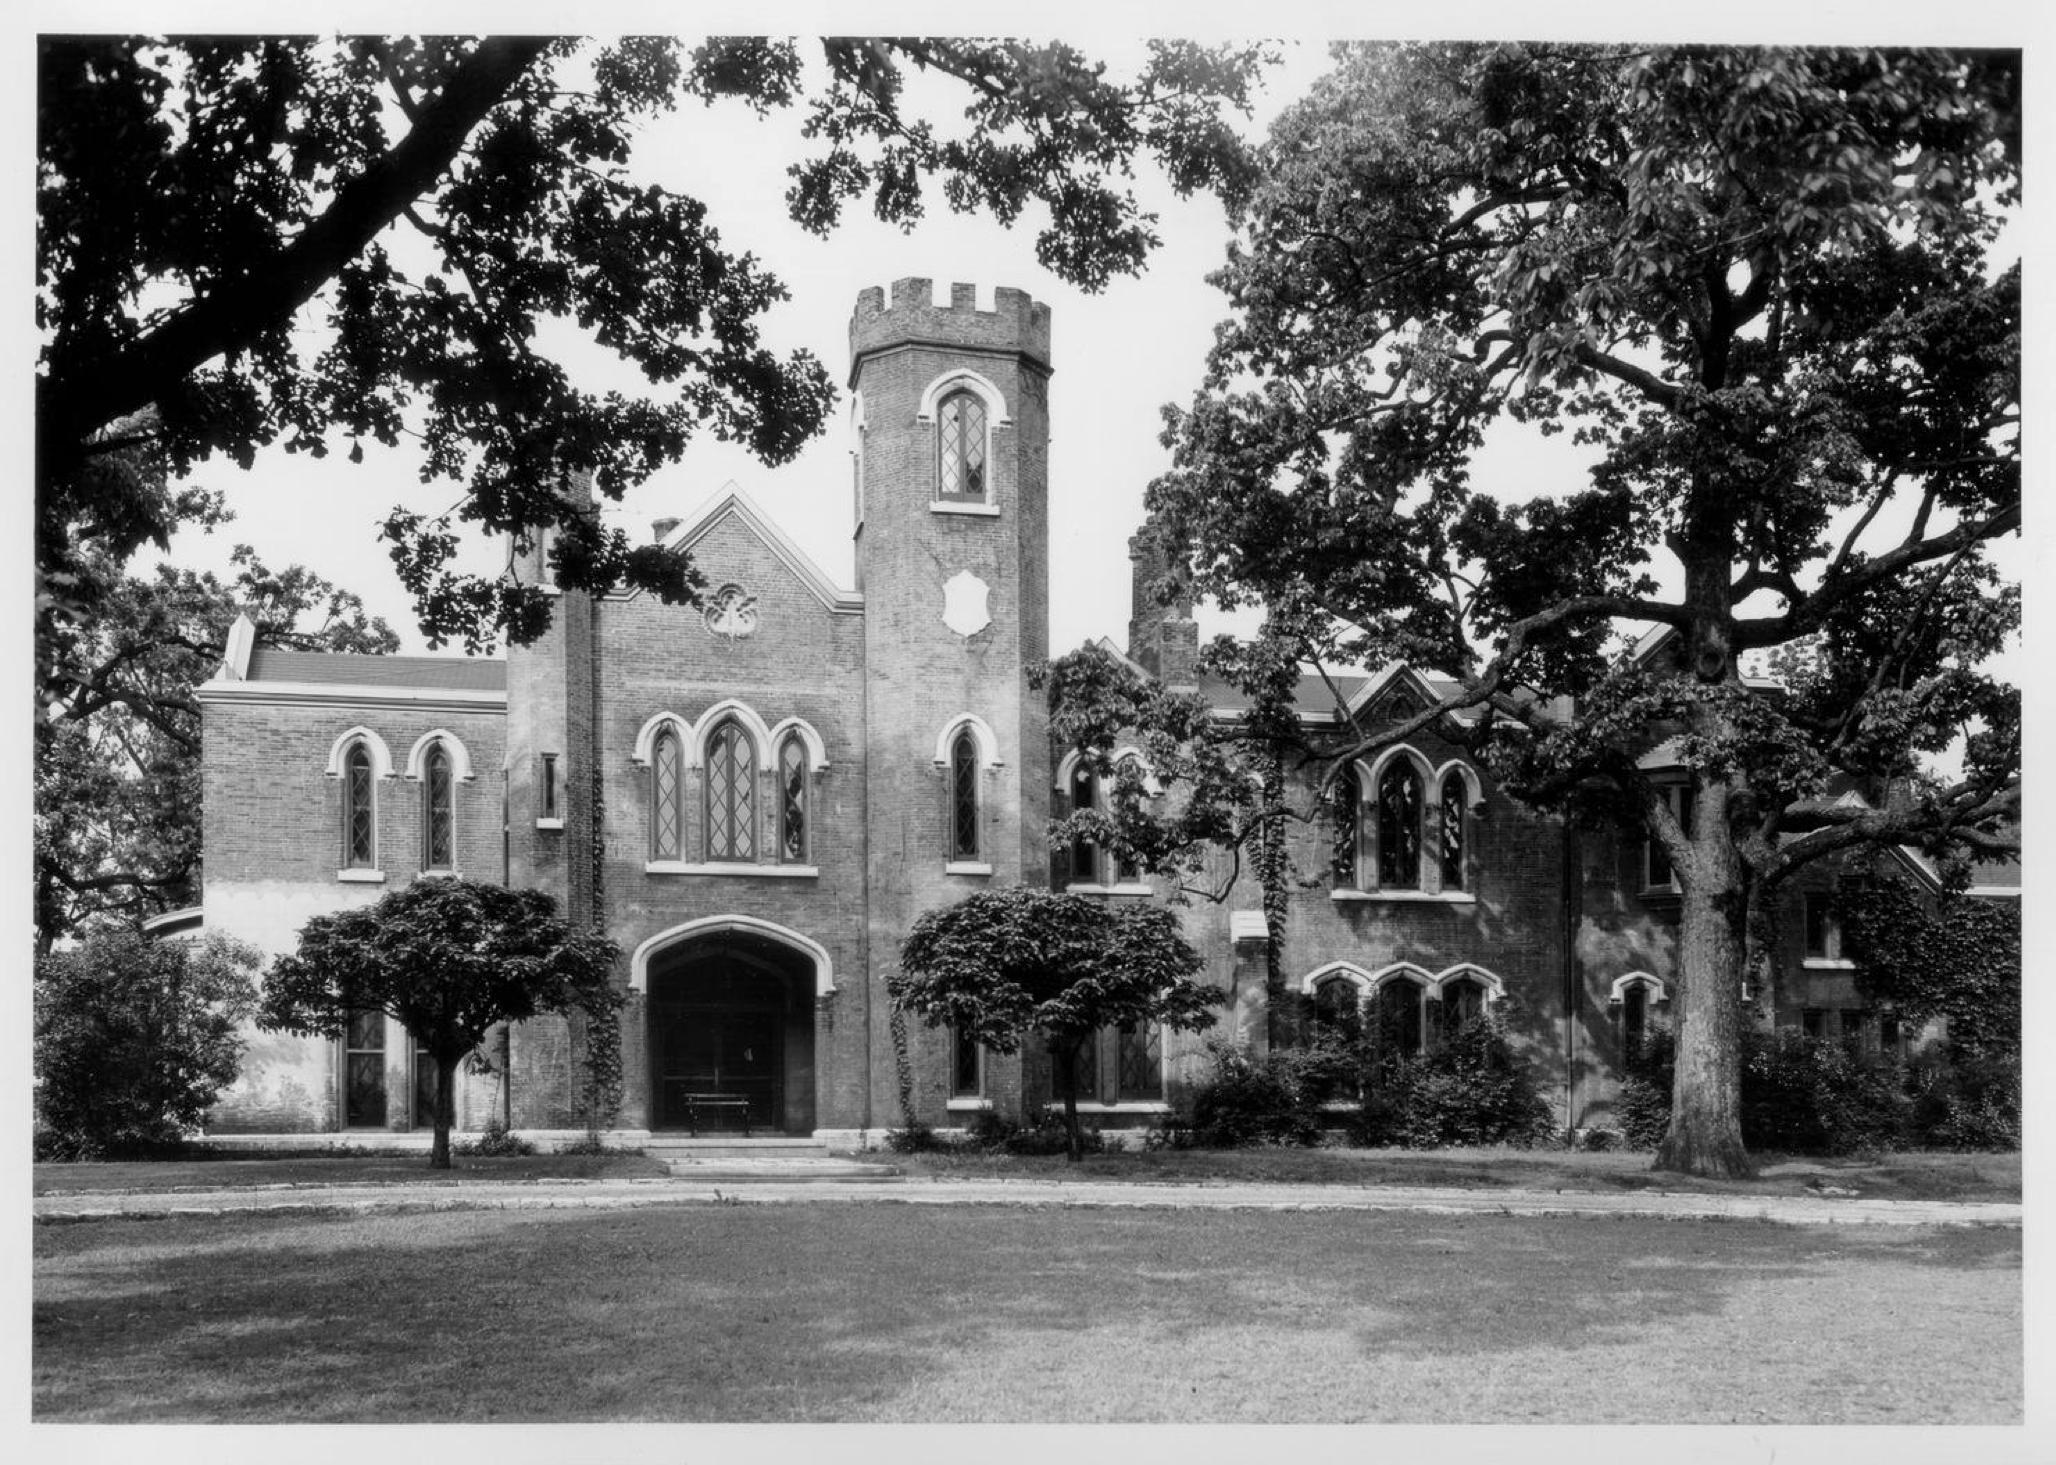 Loudoun House - 1932. Courtesy: National Park Service